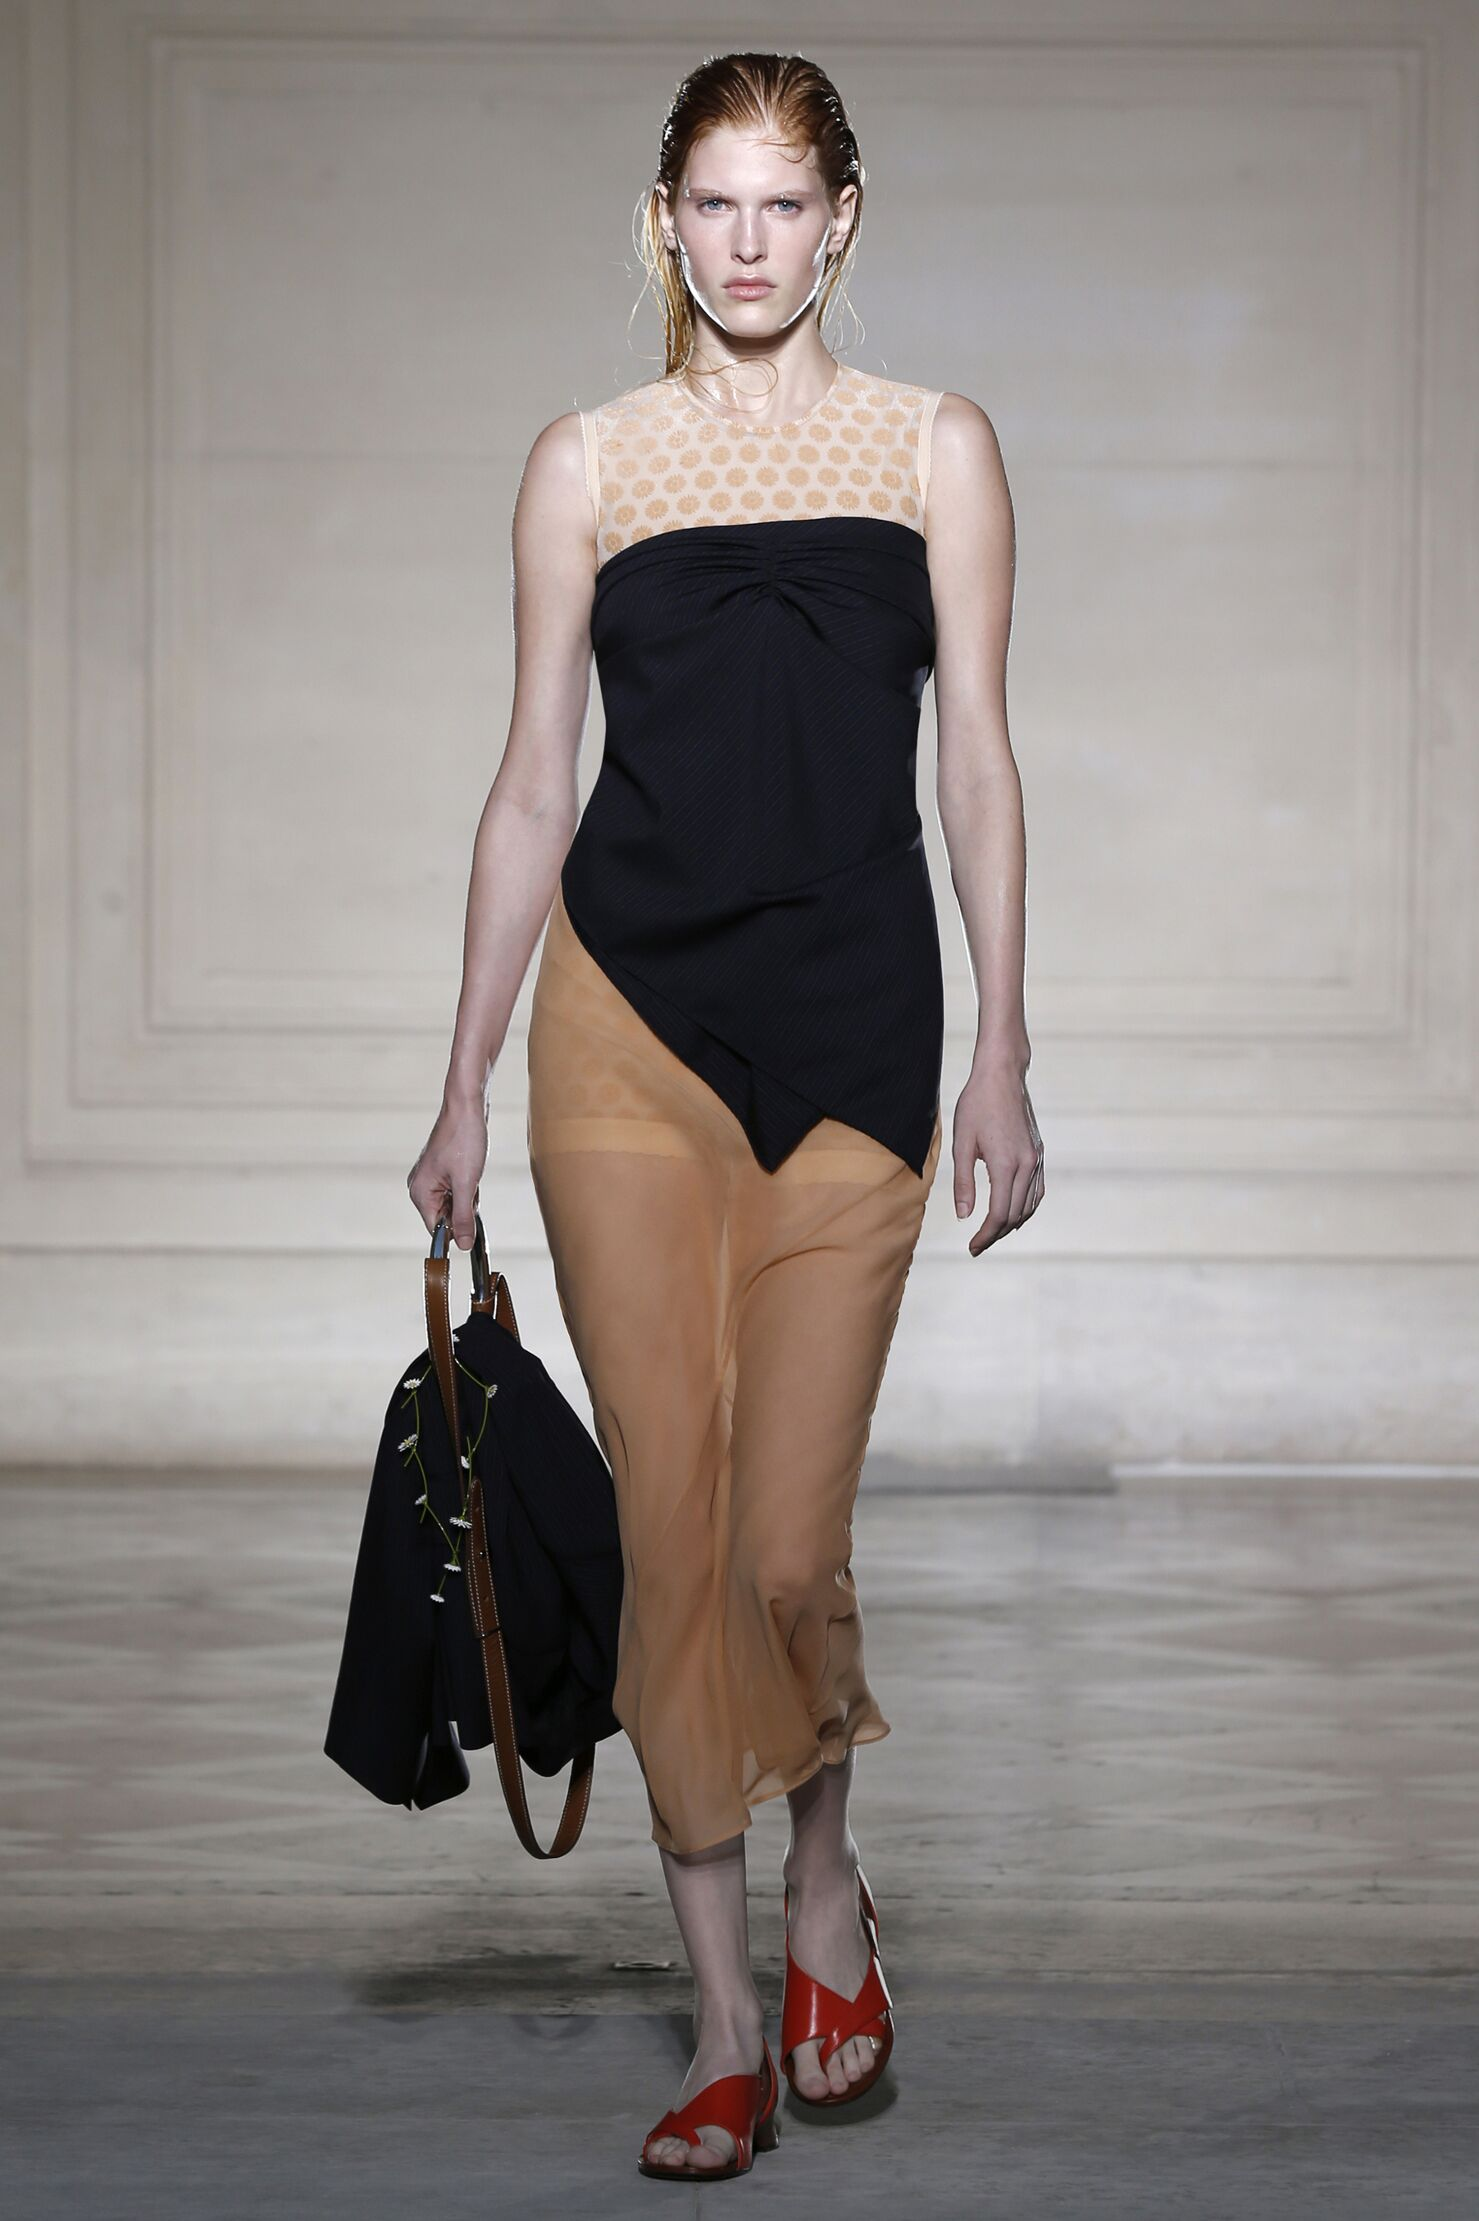 Spring Summer 2015 Fashion Model Maison Martin Margiela